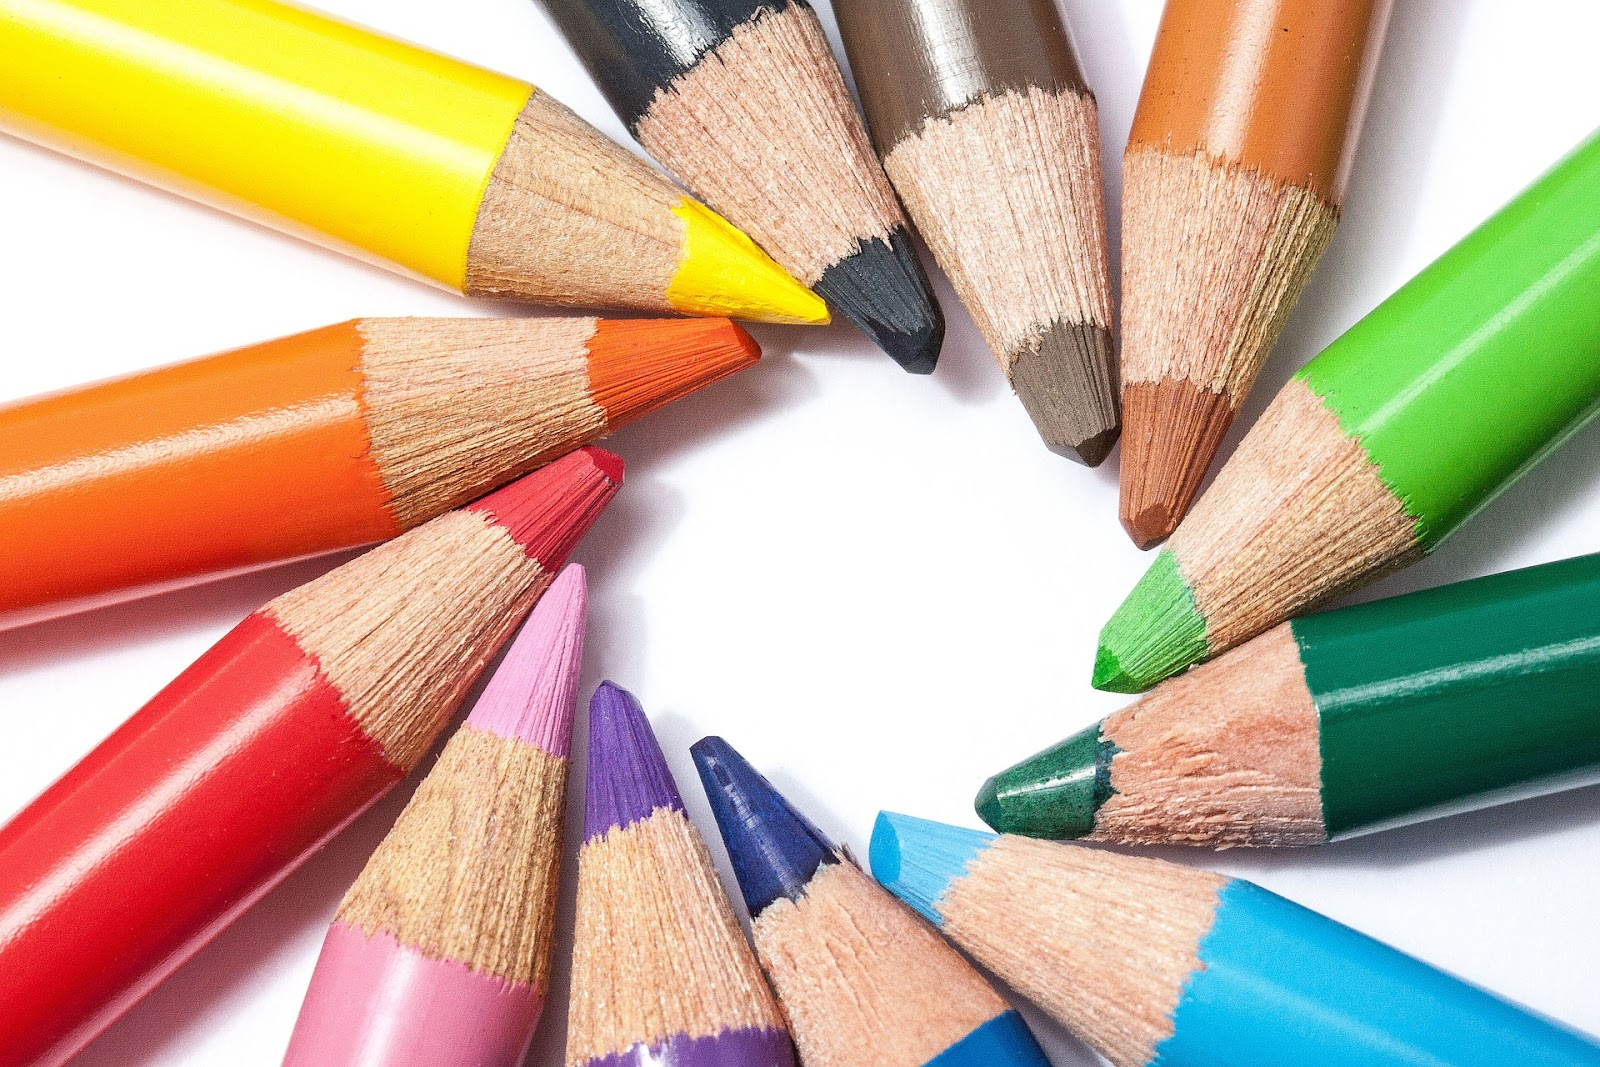 colored-pencils-374147_1920.jpg